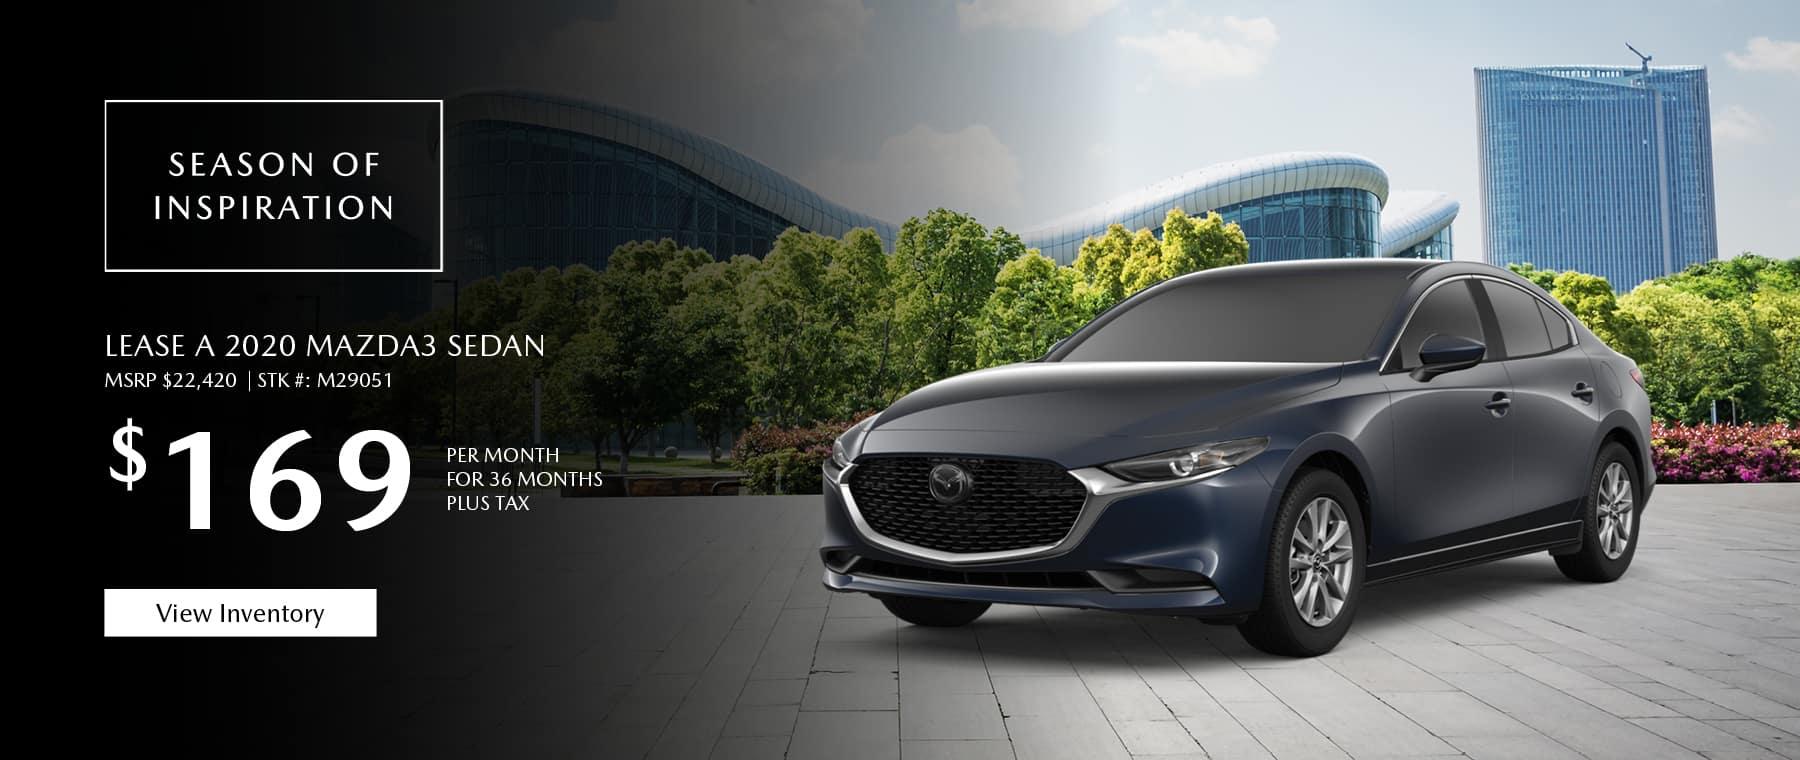 Florida Mazda Dealers >> Mazda Dealership In Fort Lauderdale South Florida Gunther